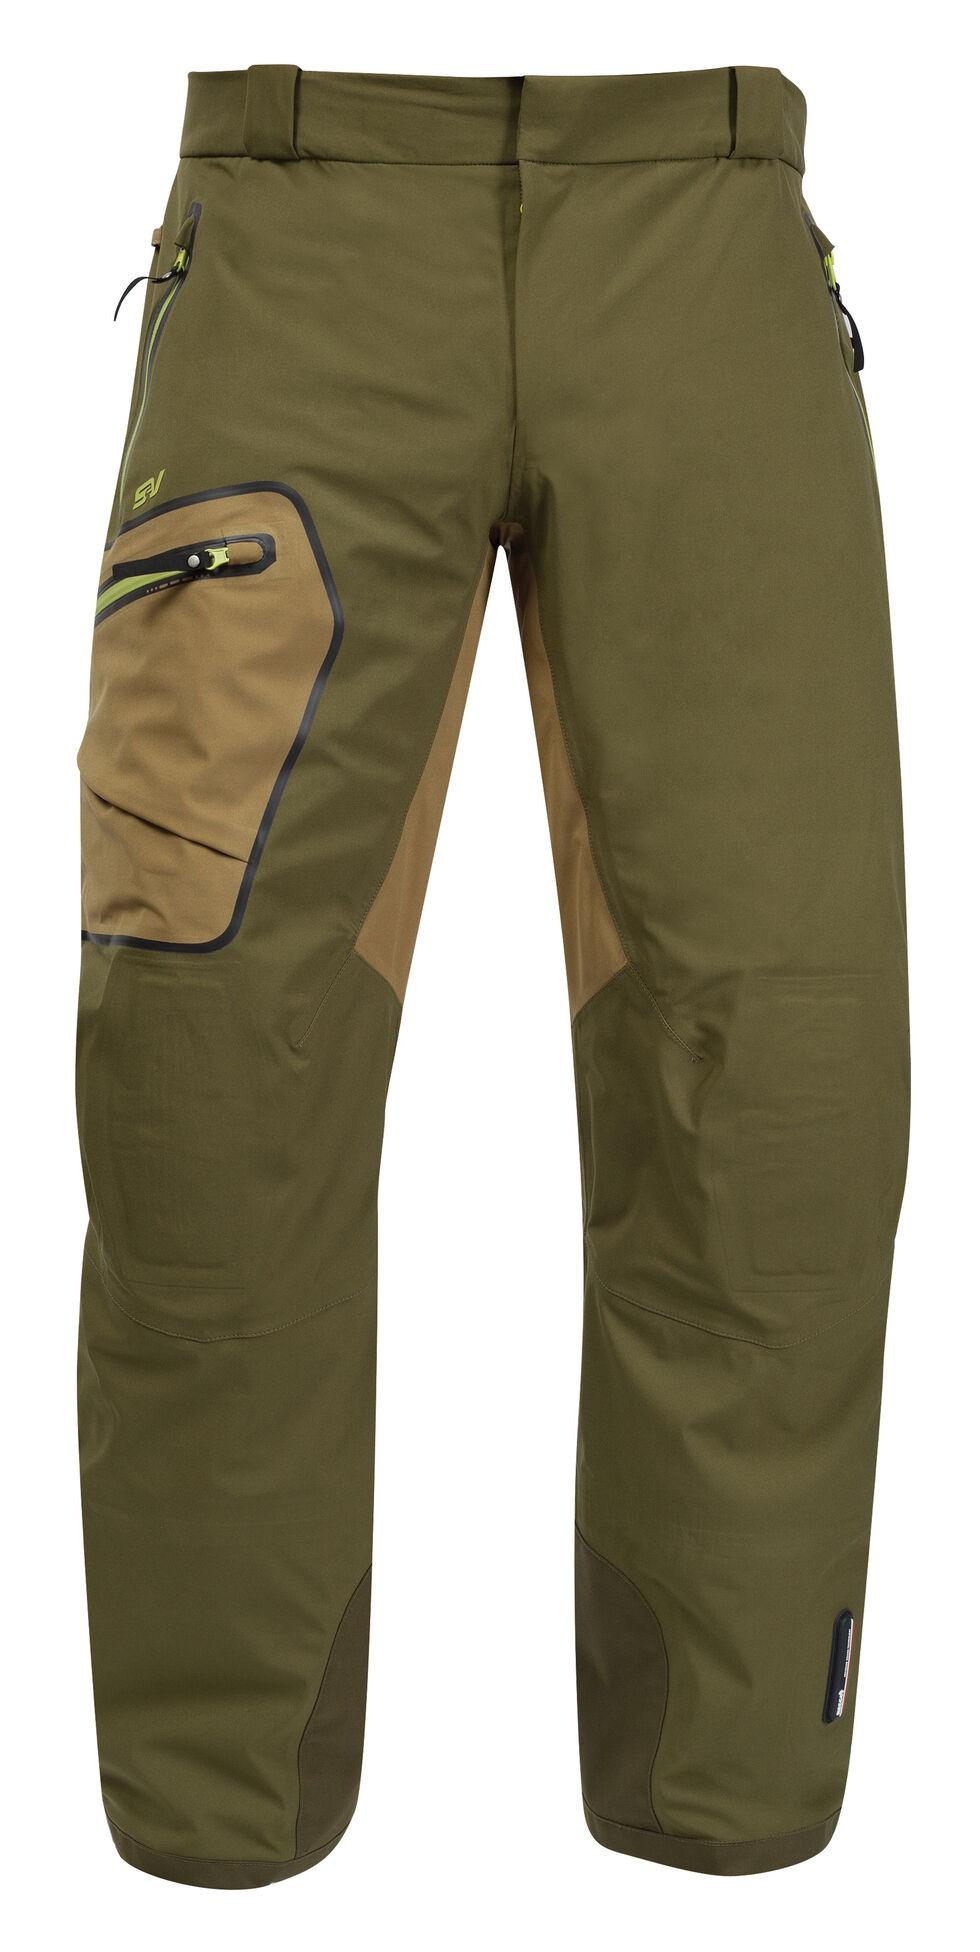 Rocky Men's Waterproof S2V Provision Pants, Olive Green, hi-res